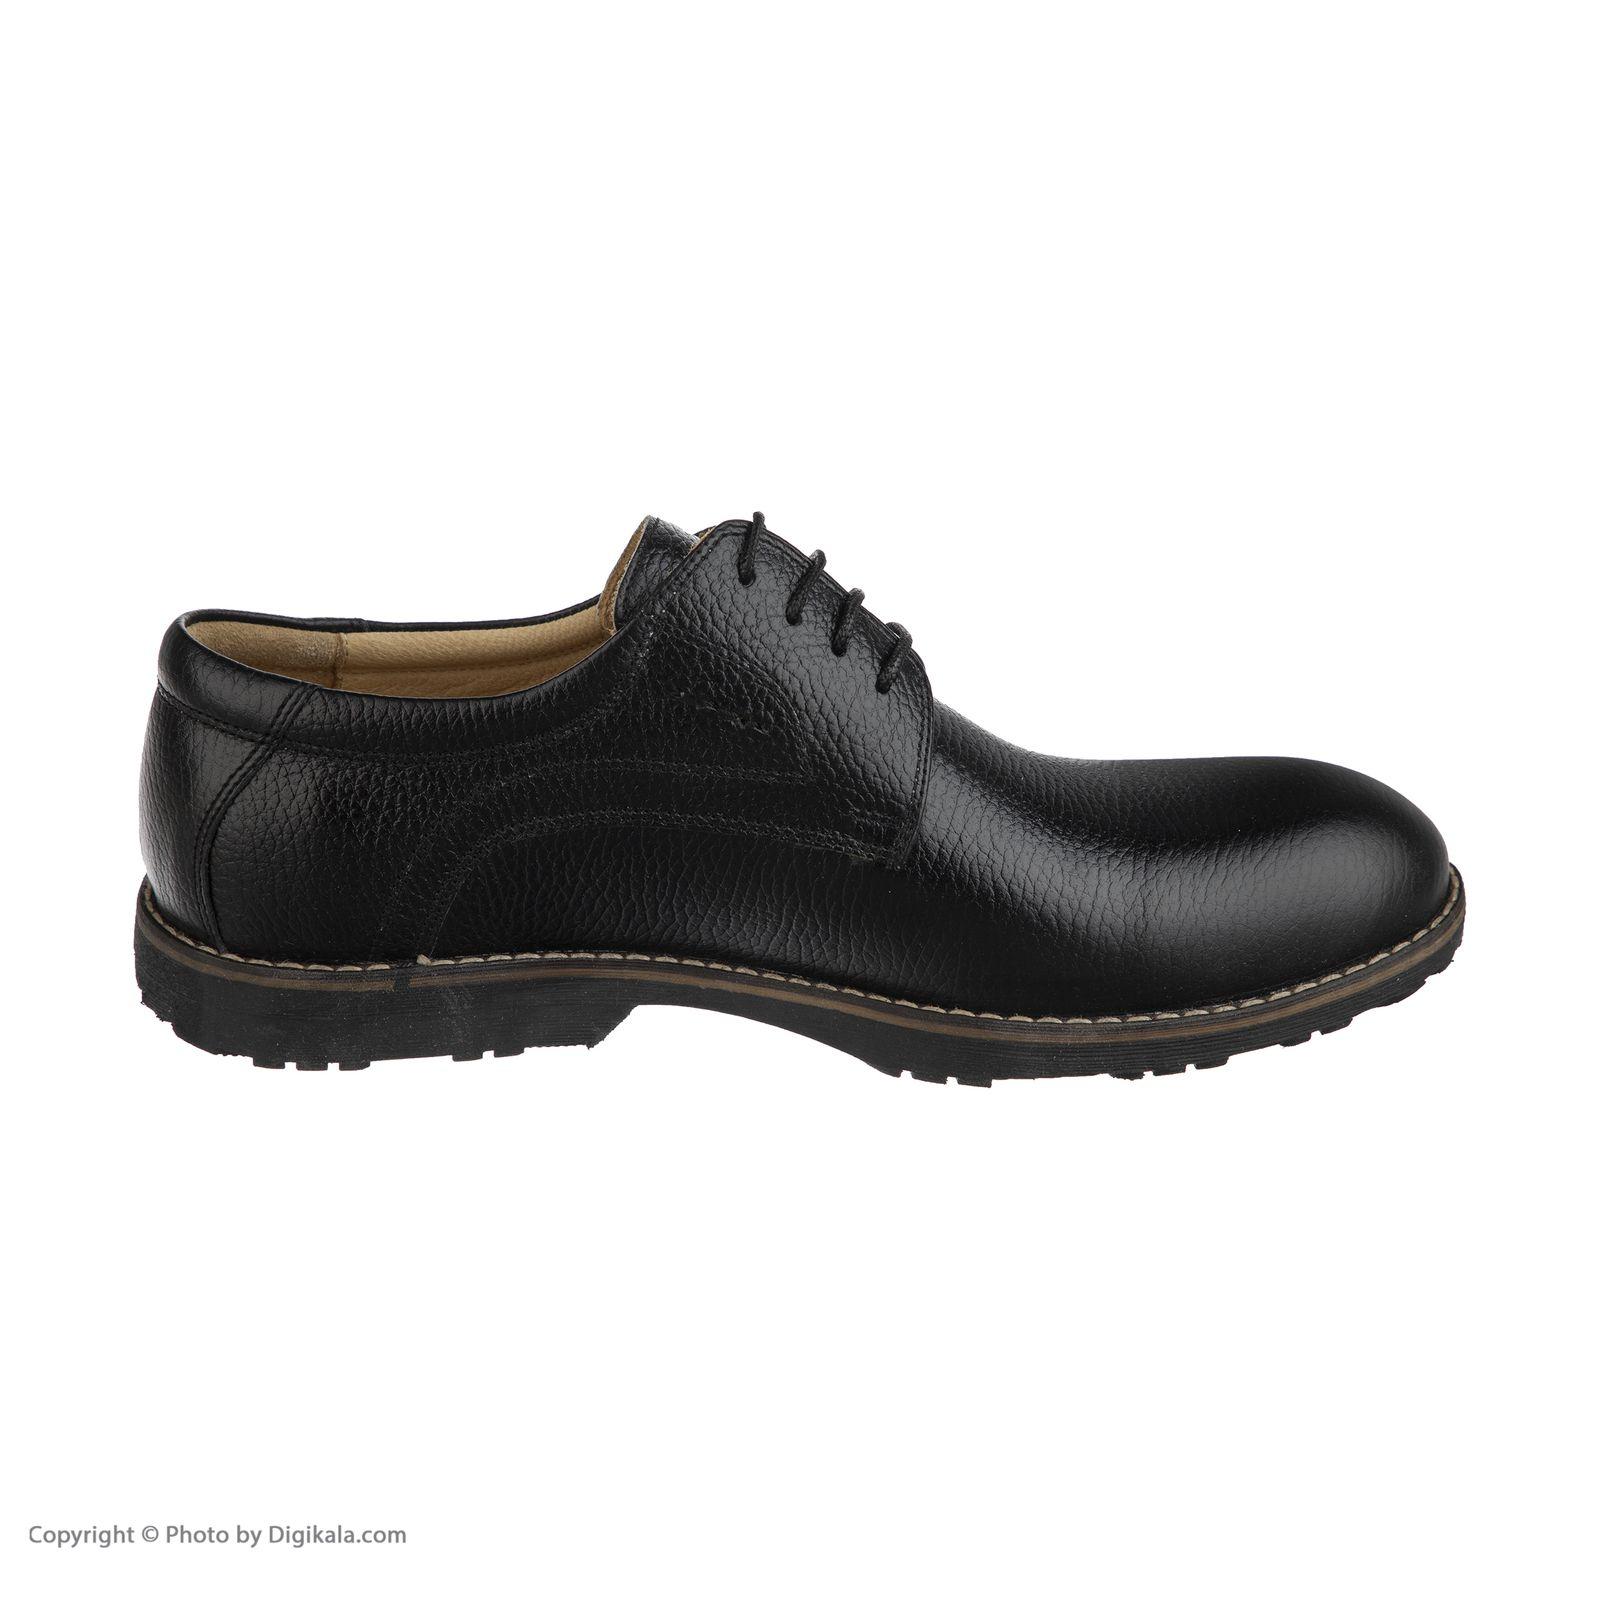 کفش روزمره مردانه شیفر مدل 7046N503101 -  - 7